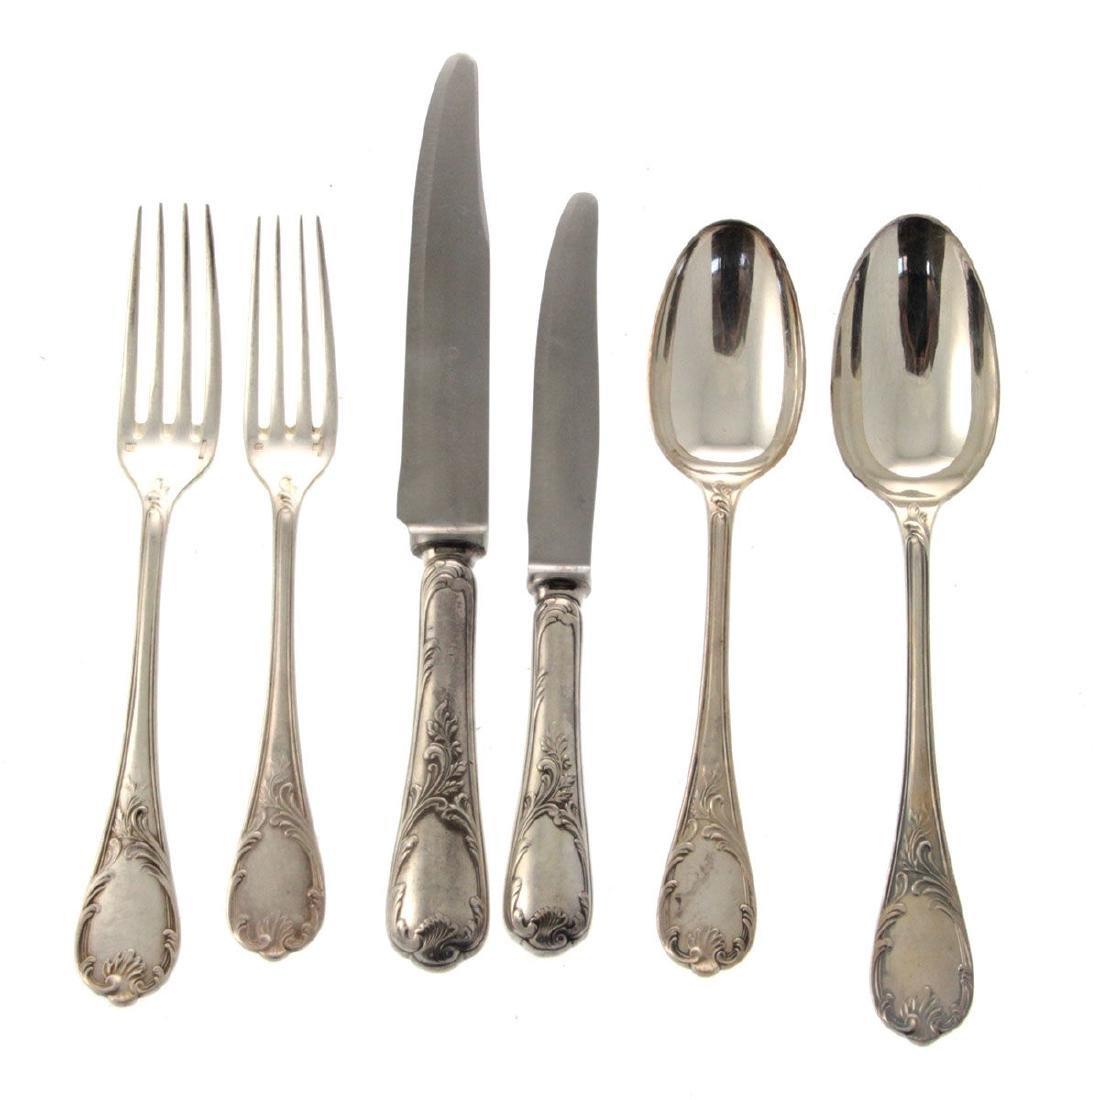 Christofle 65pcs Silver Plated Flatware Cutlery Set, - 2